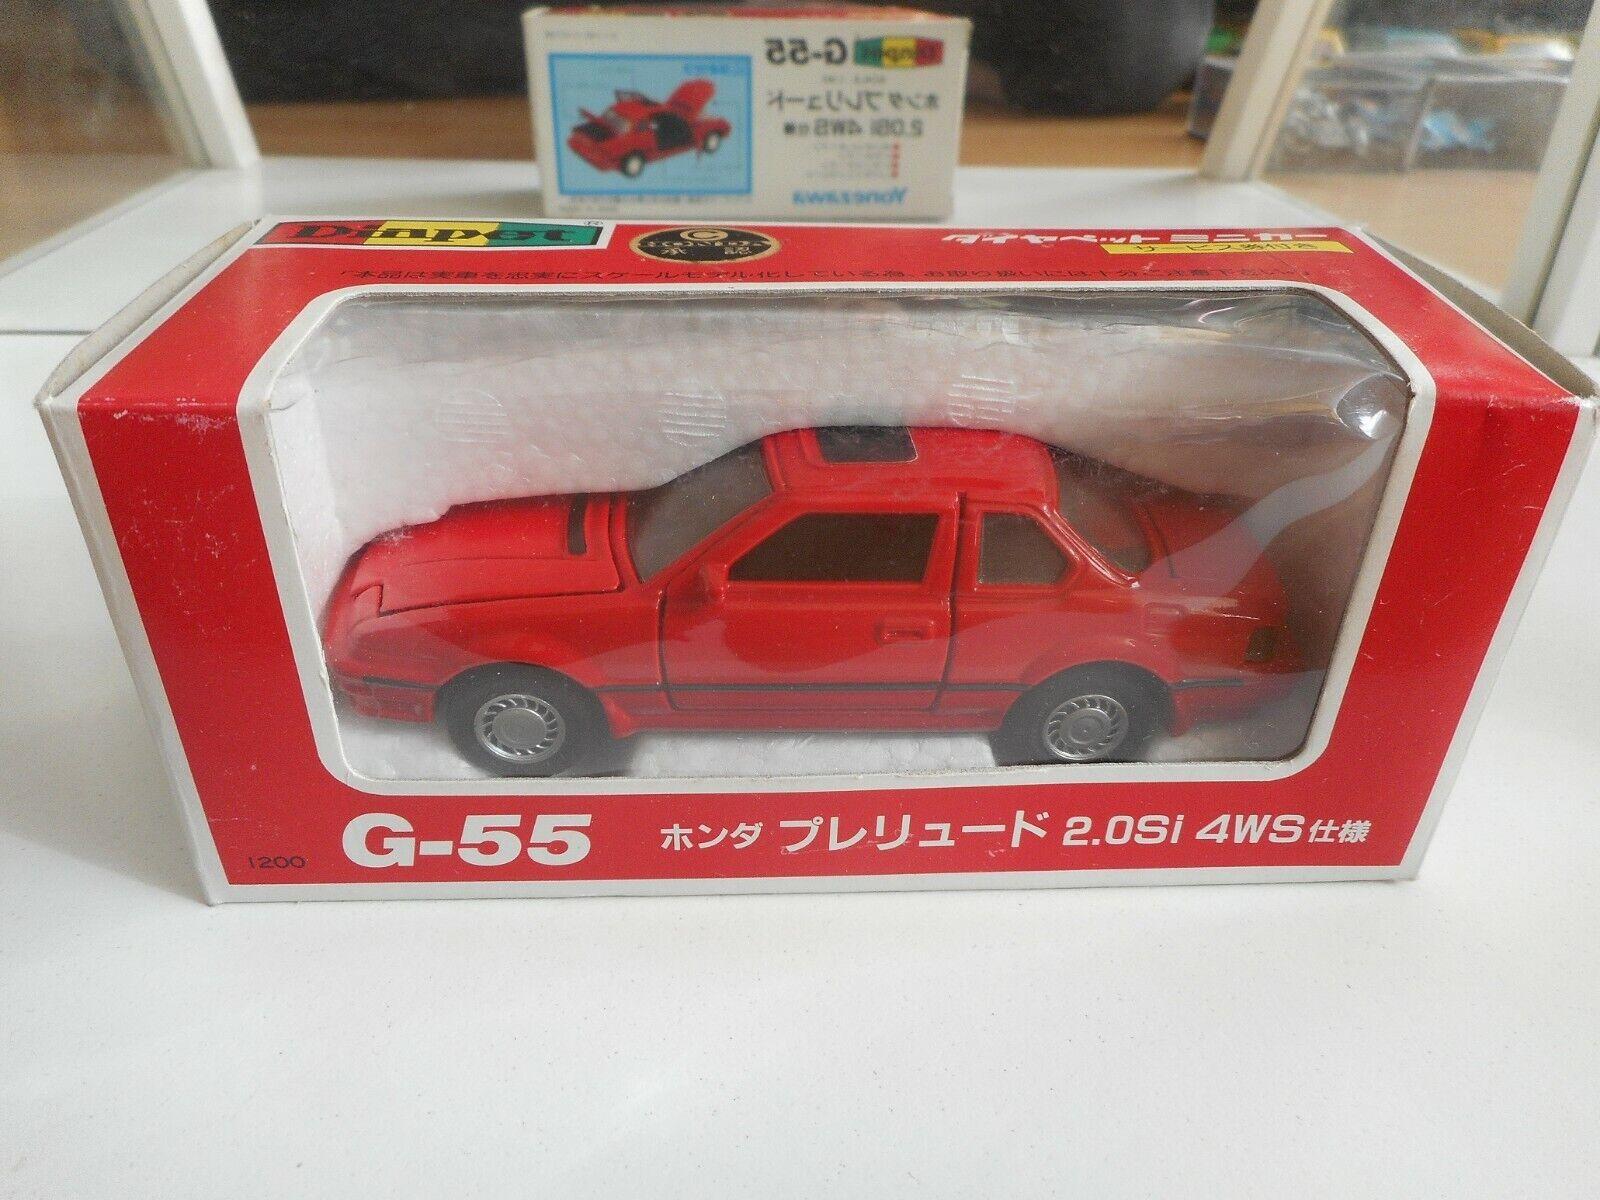 Yonezawa Diapet Honda Prelude 2.0 SI 4Ws in red on 1 40 in Box